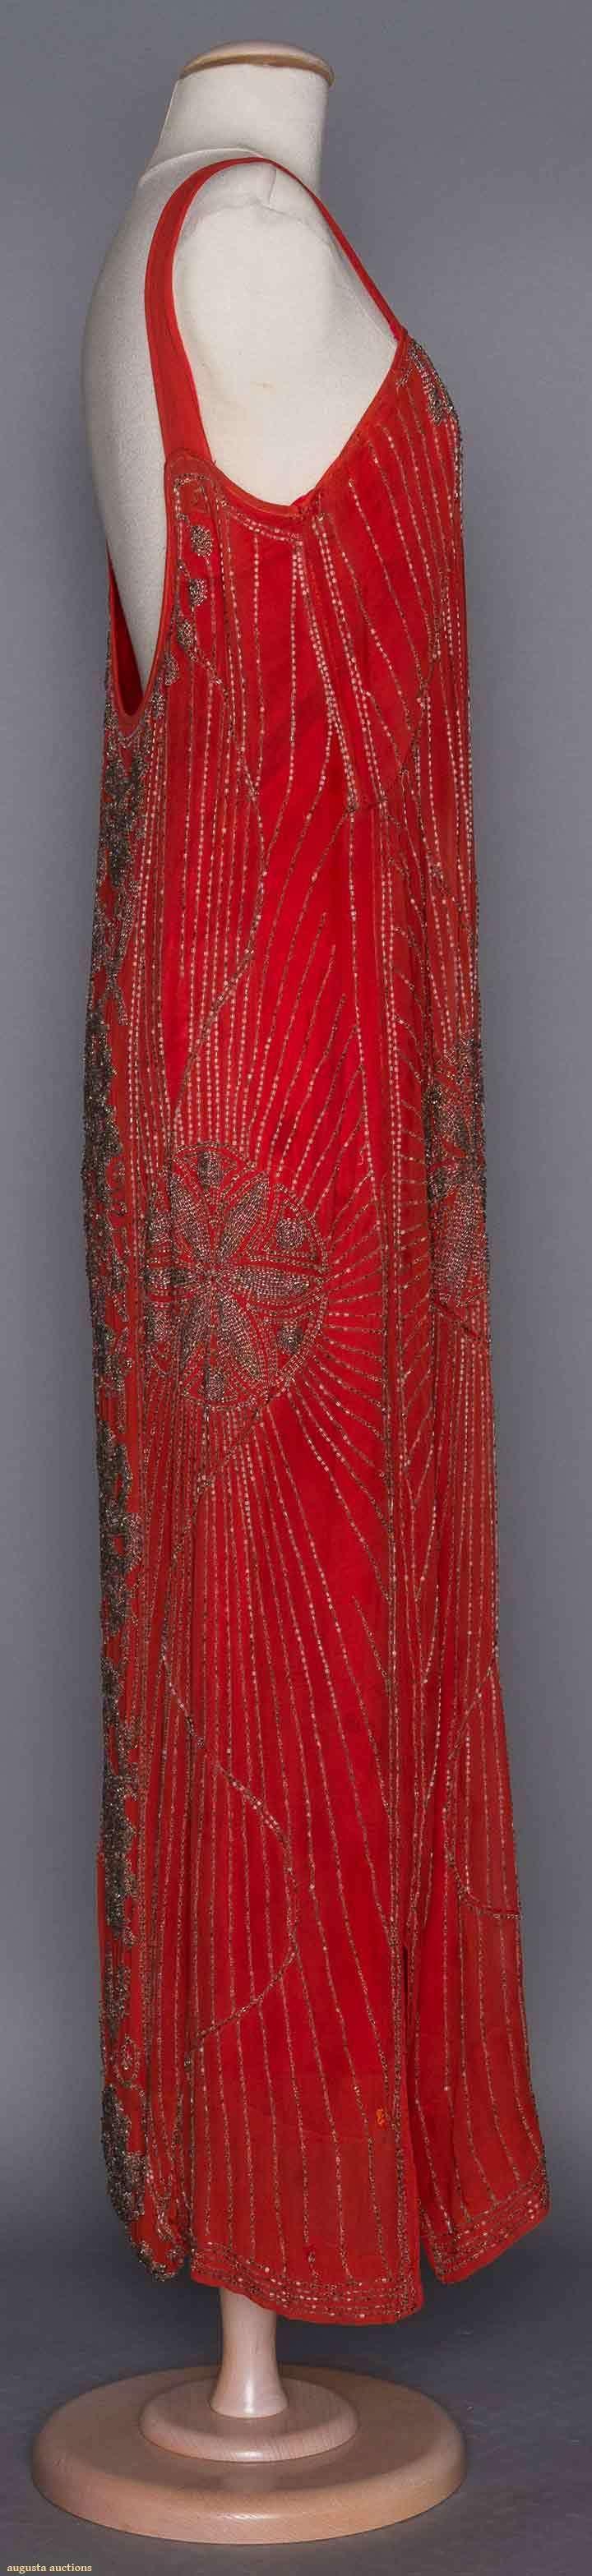 c1920 Silk chiffon, silver beads form floral & star patterns, dress & wide shoulder straps have added silk under dress. Sideway